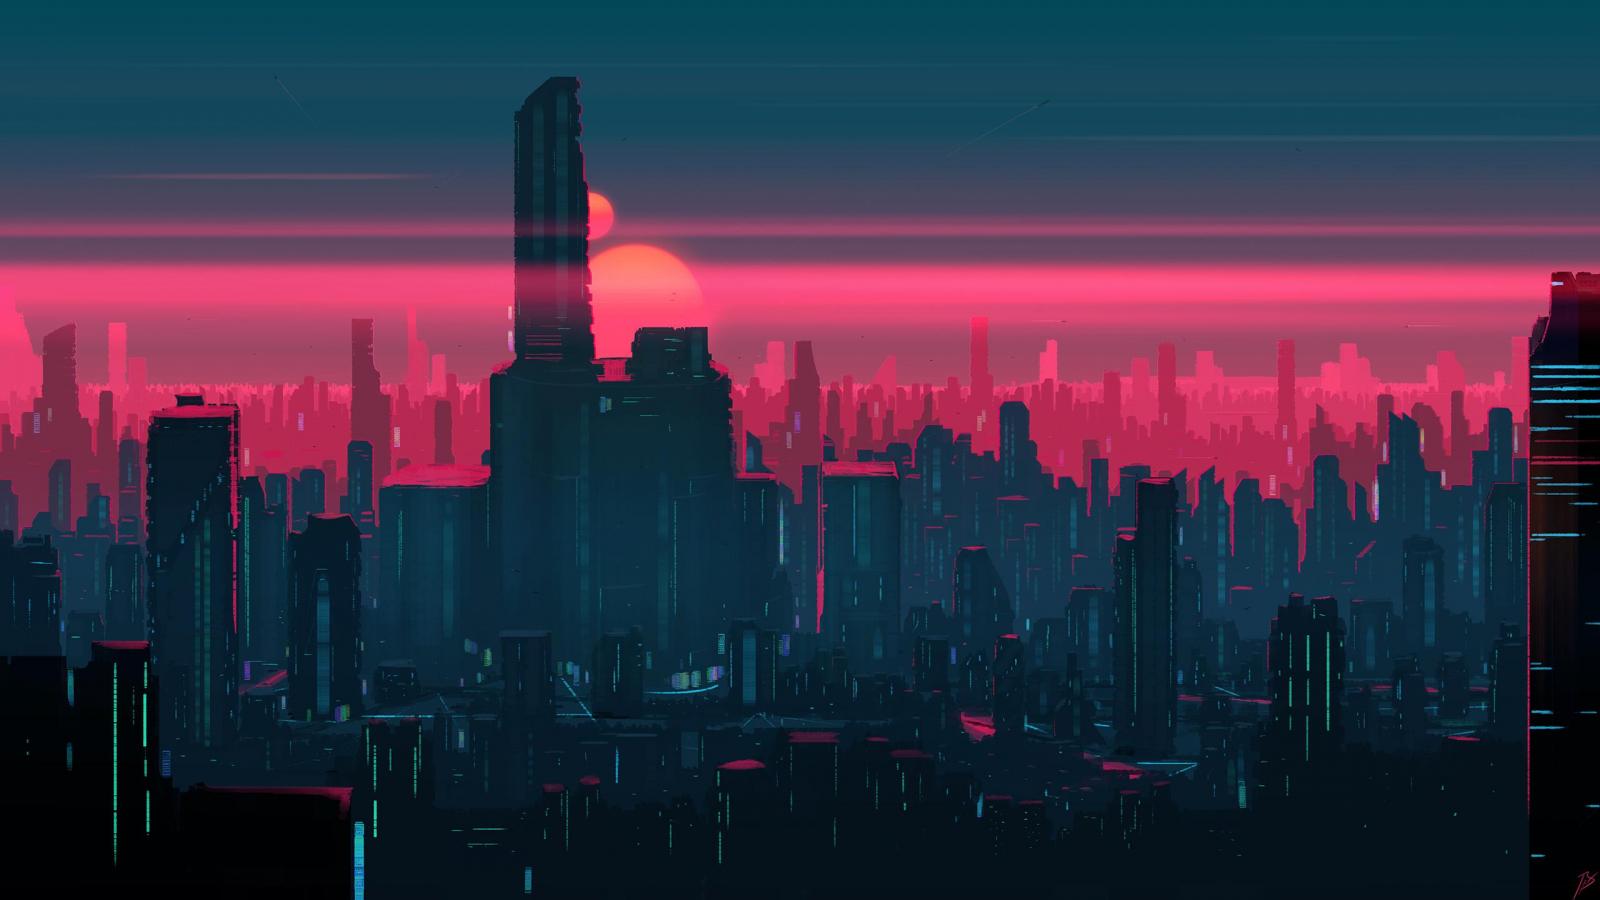 Free download Neon City 2560x1440 wallpaper [2560x1440 ...